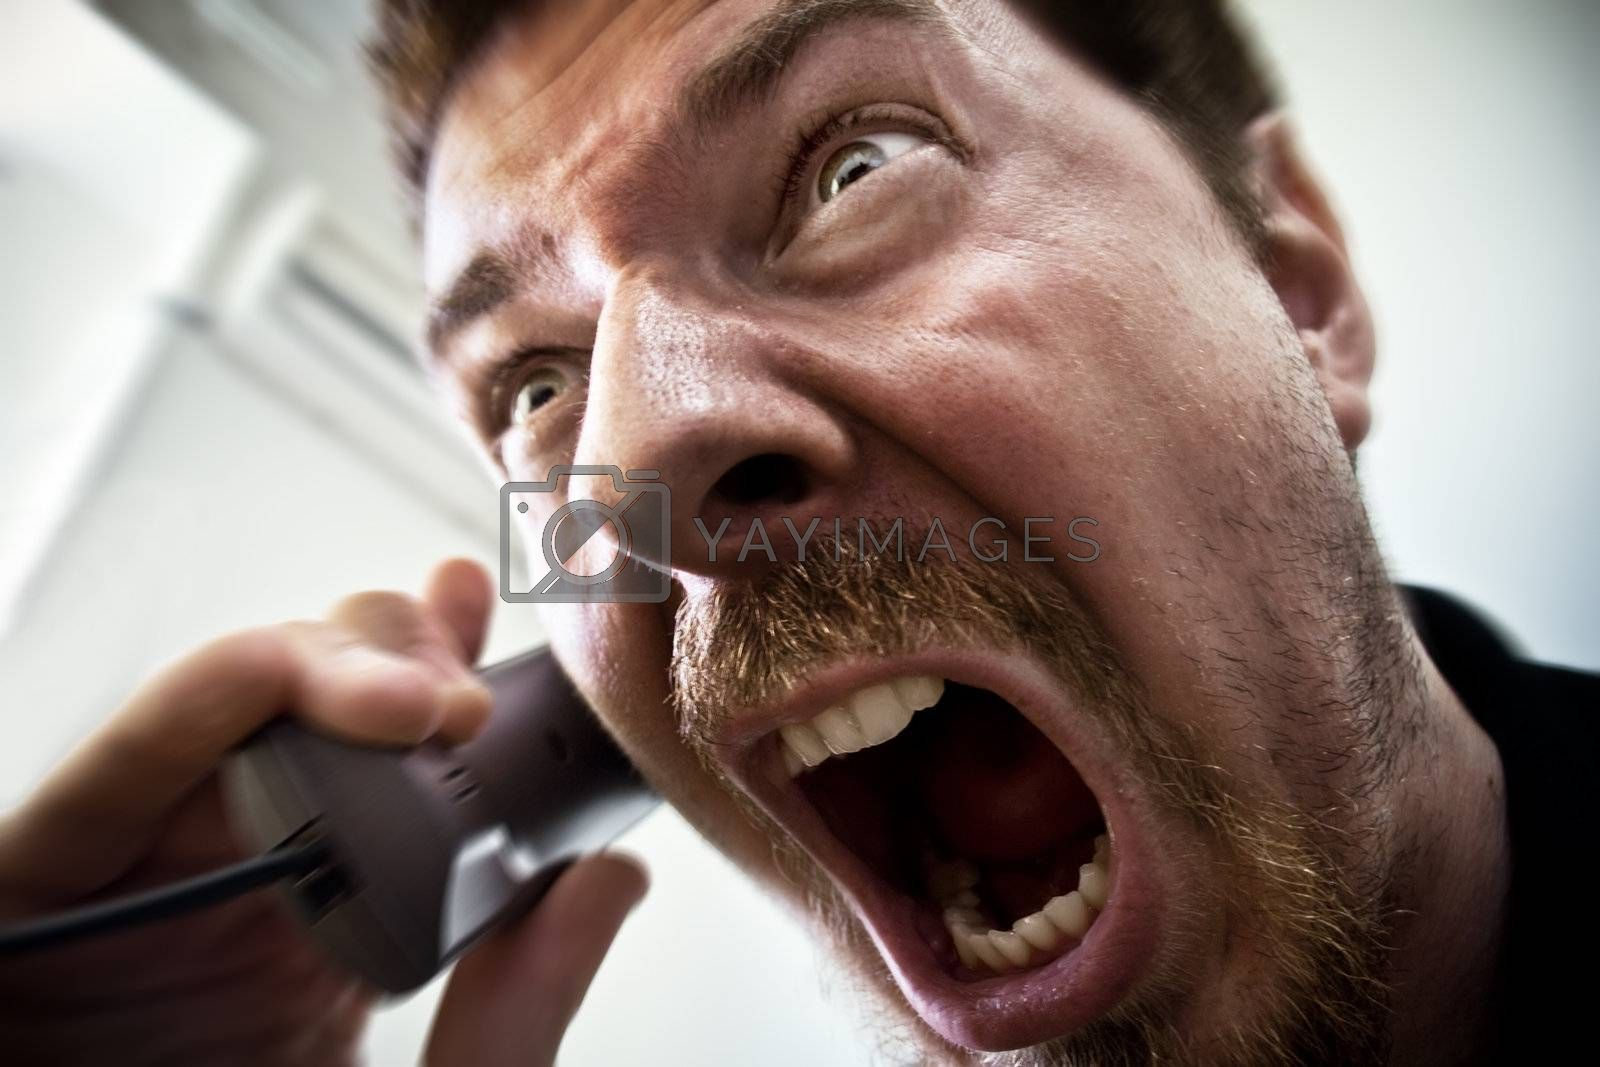 Man shouting at telephone by dundanim